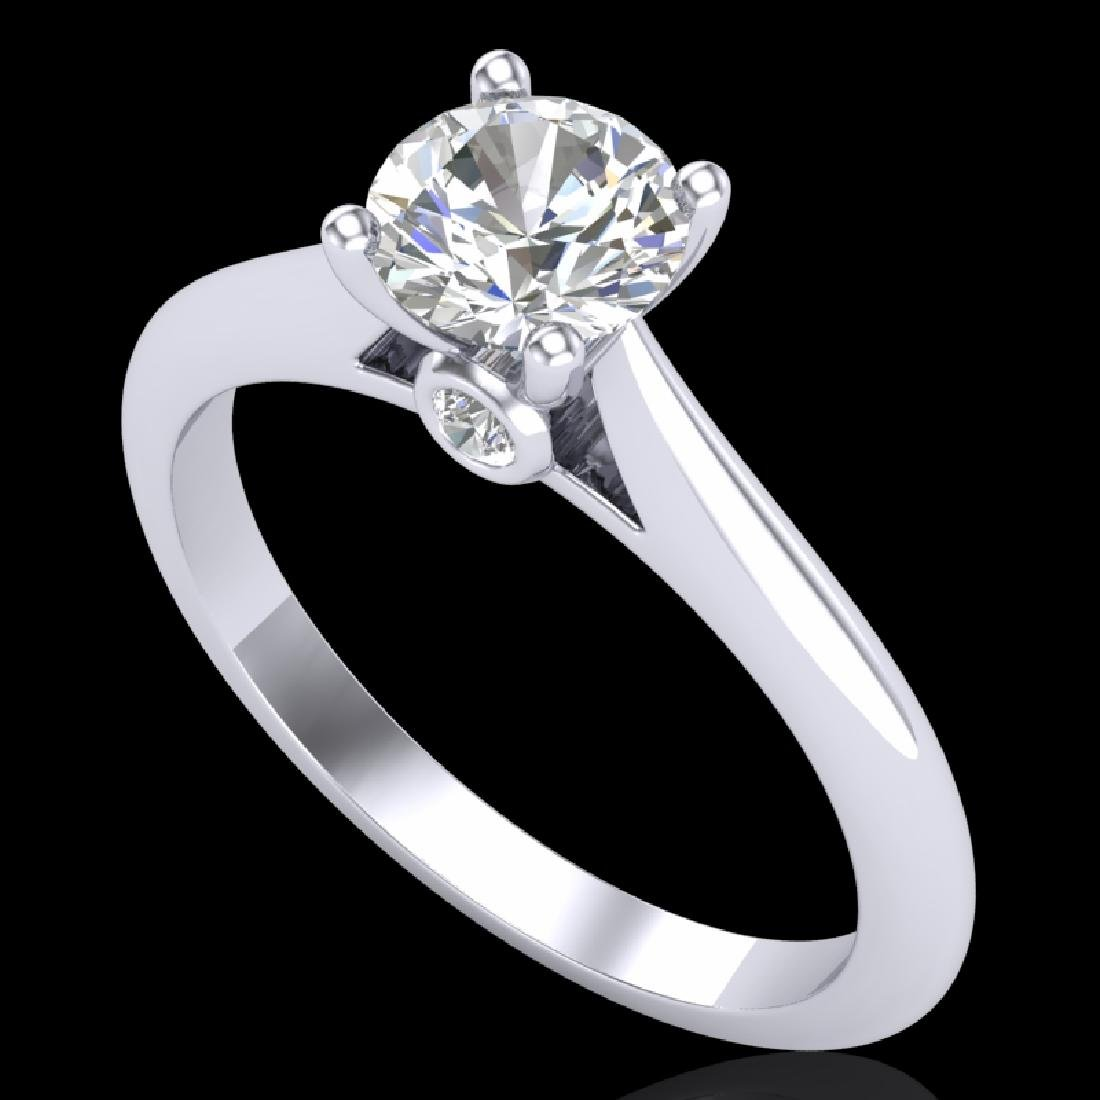 0.83 CTW VS/SI Diamond Solitaire Art Deco Ring 18K Gold